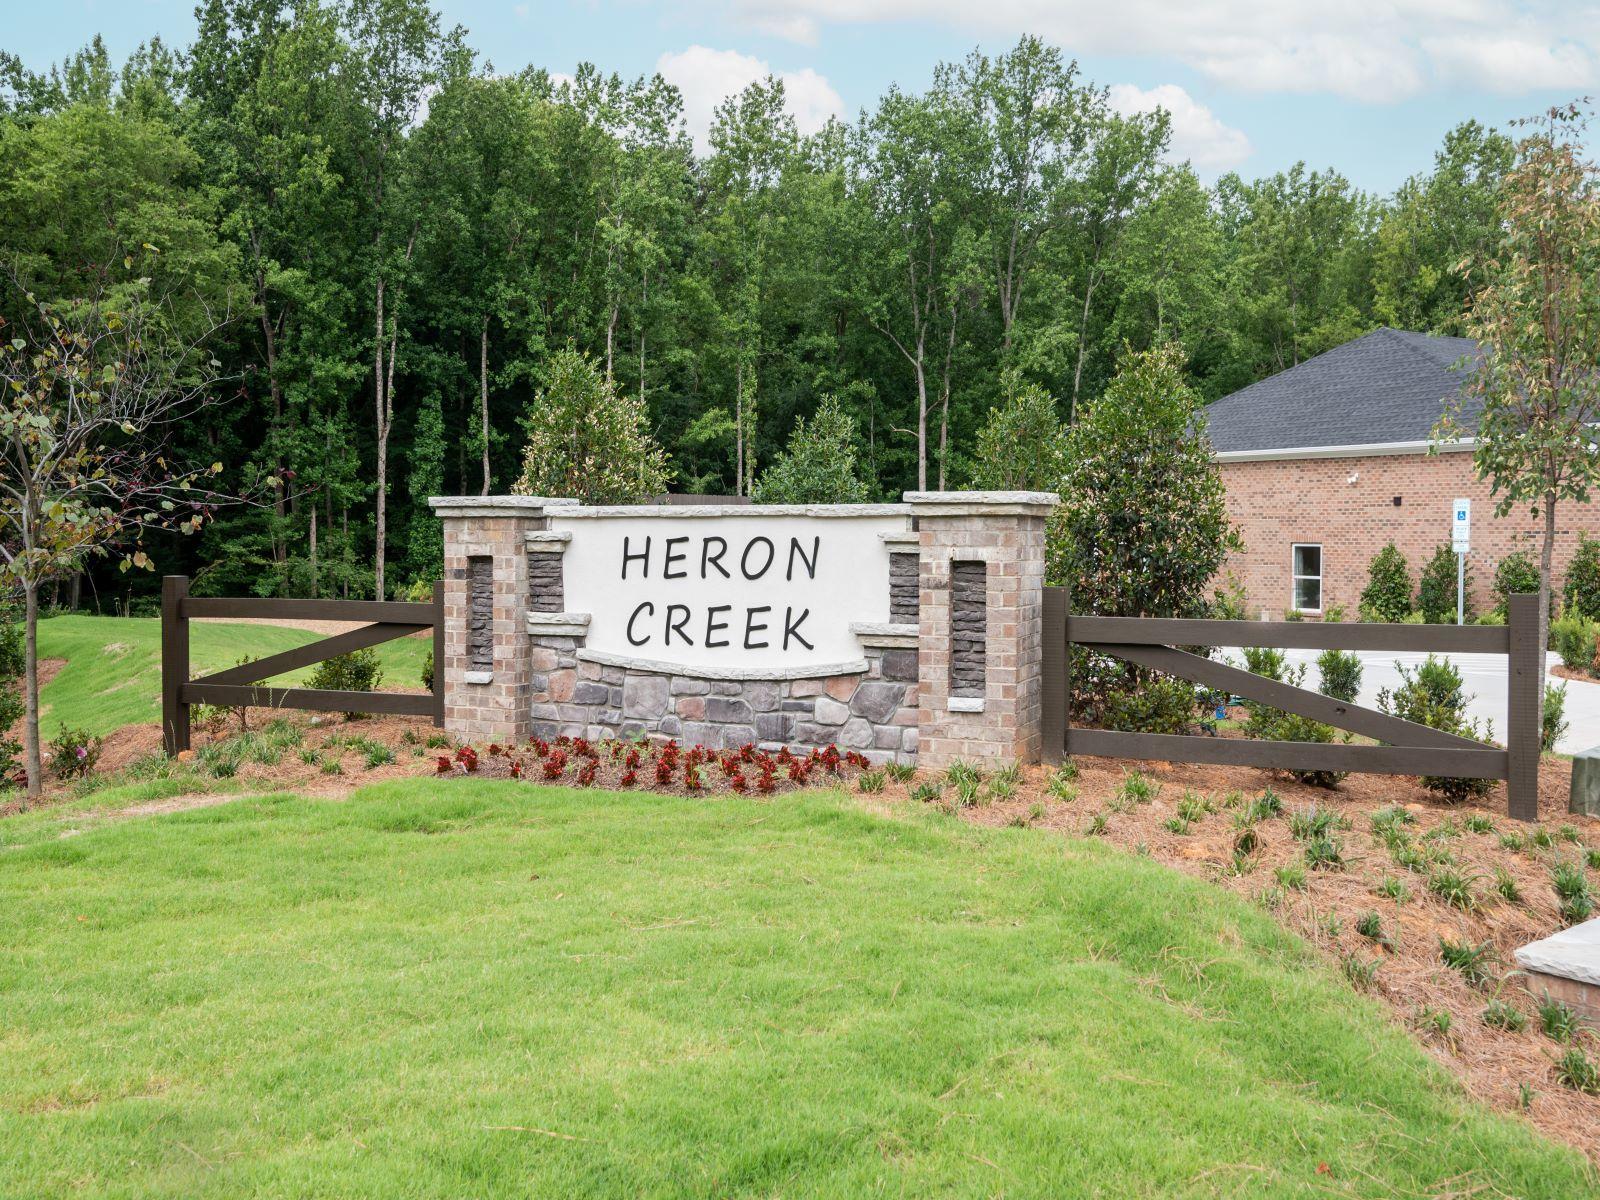 Heron Creek Monument Entrance Sign